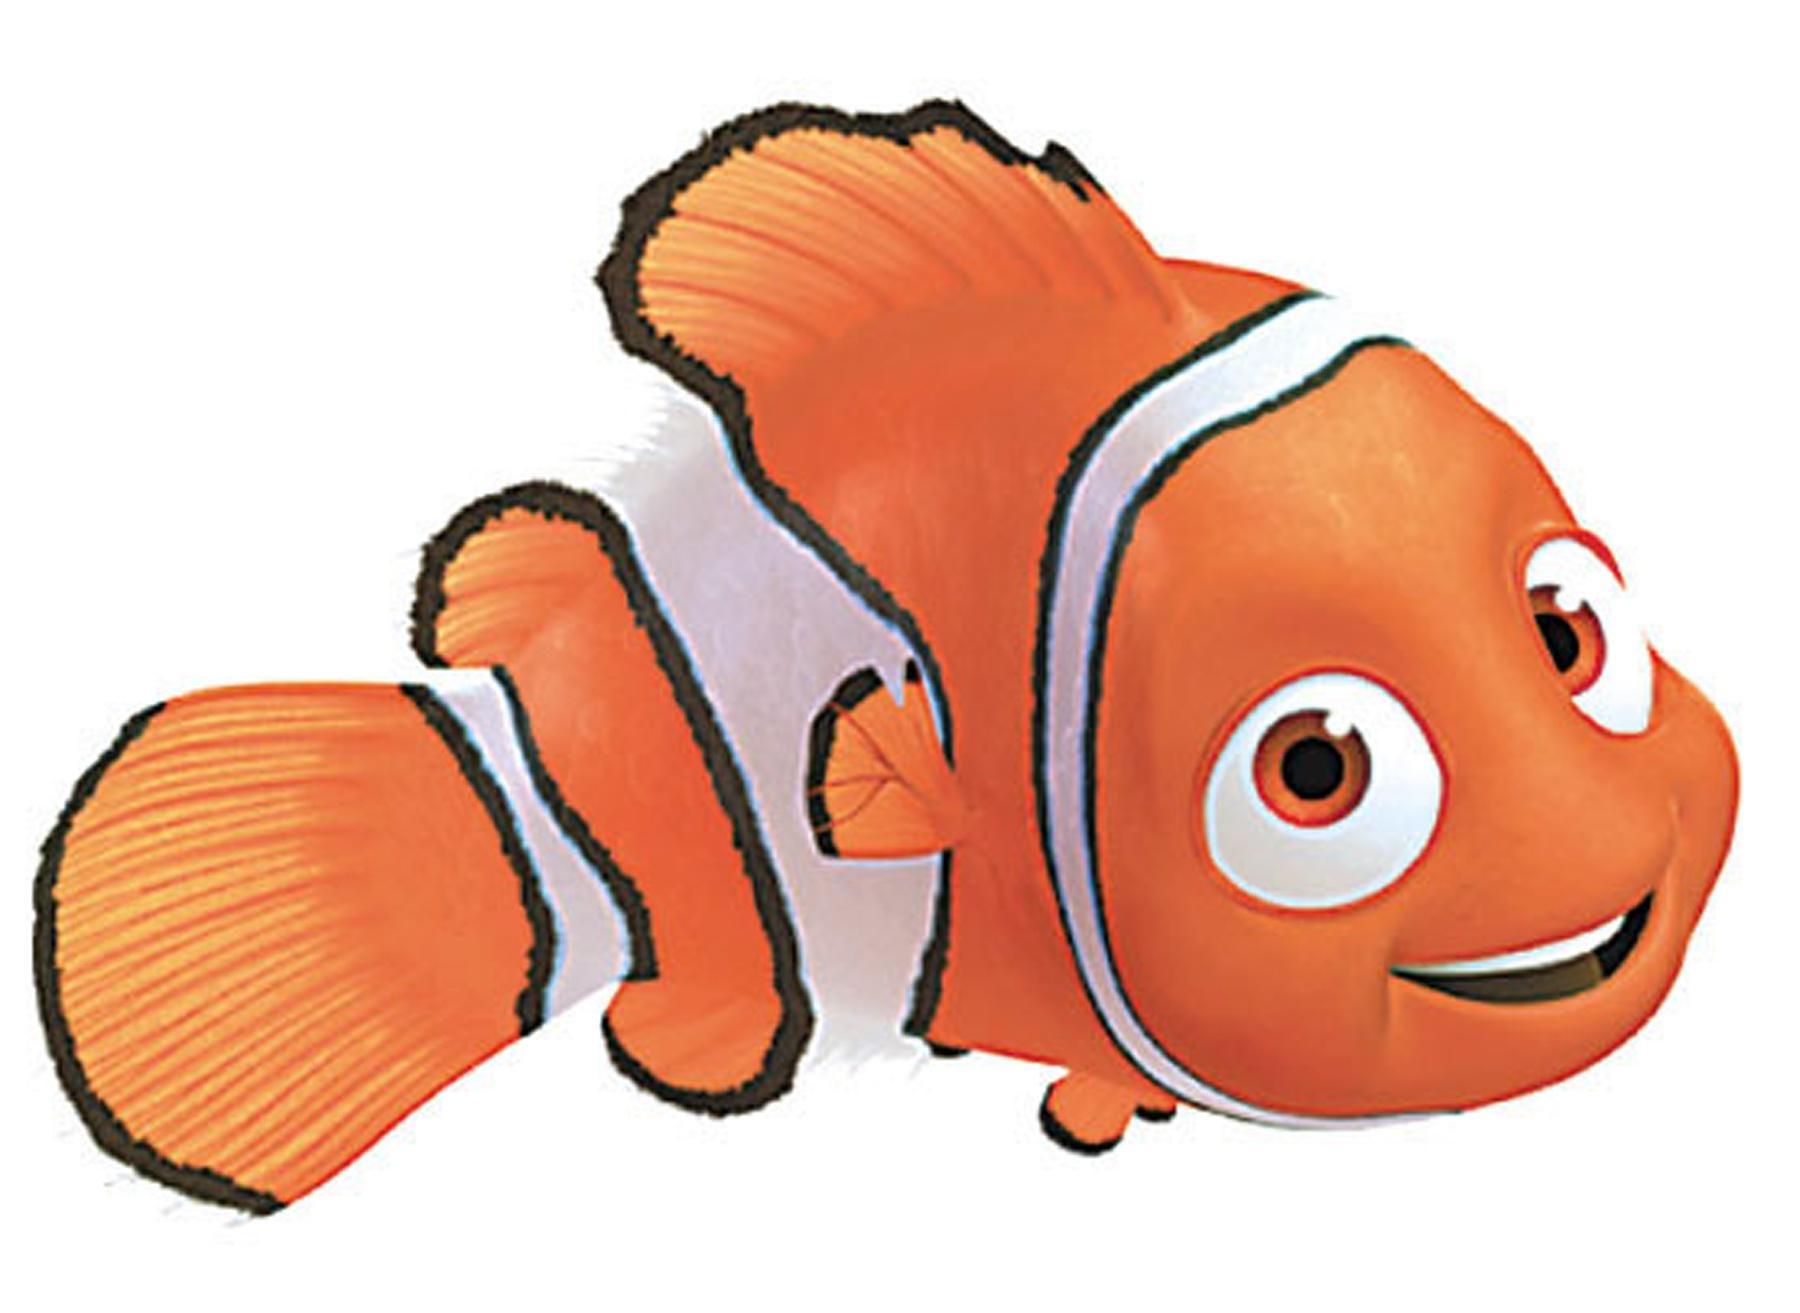 1800x1313 Ingenious Idea Nemo Clipart Black And White Finding Clip Art